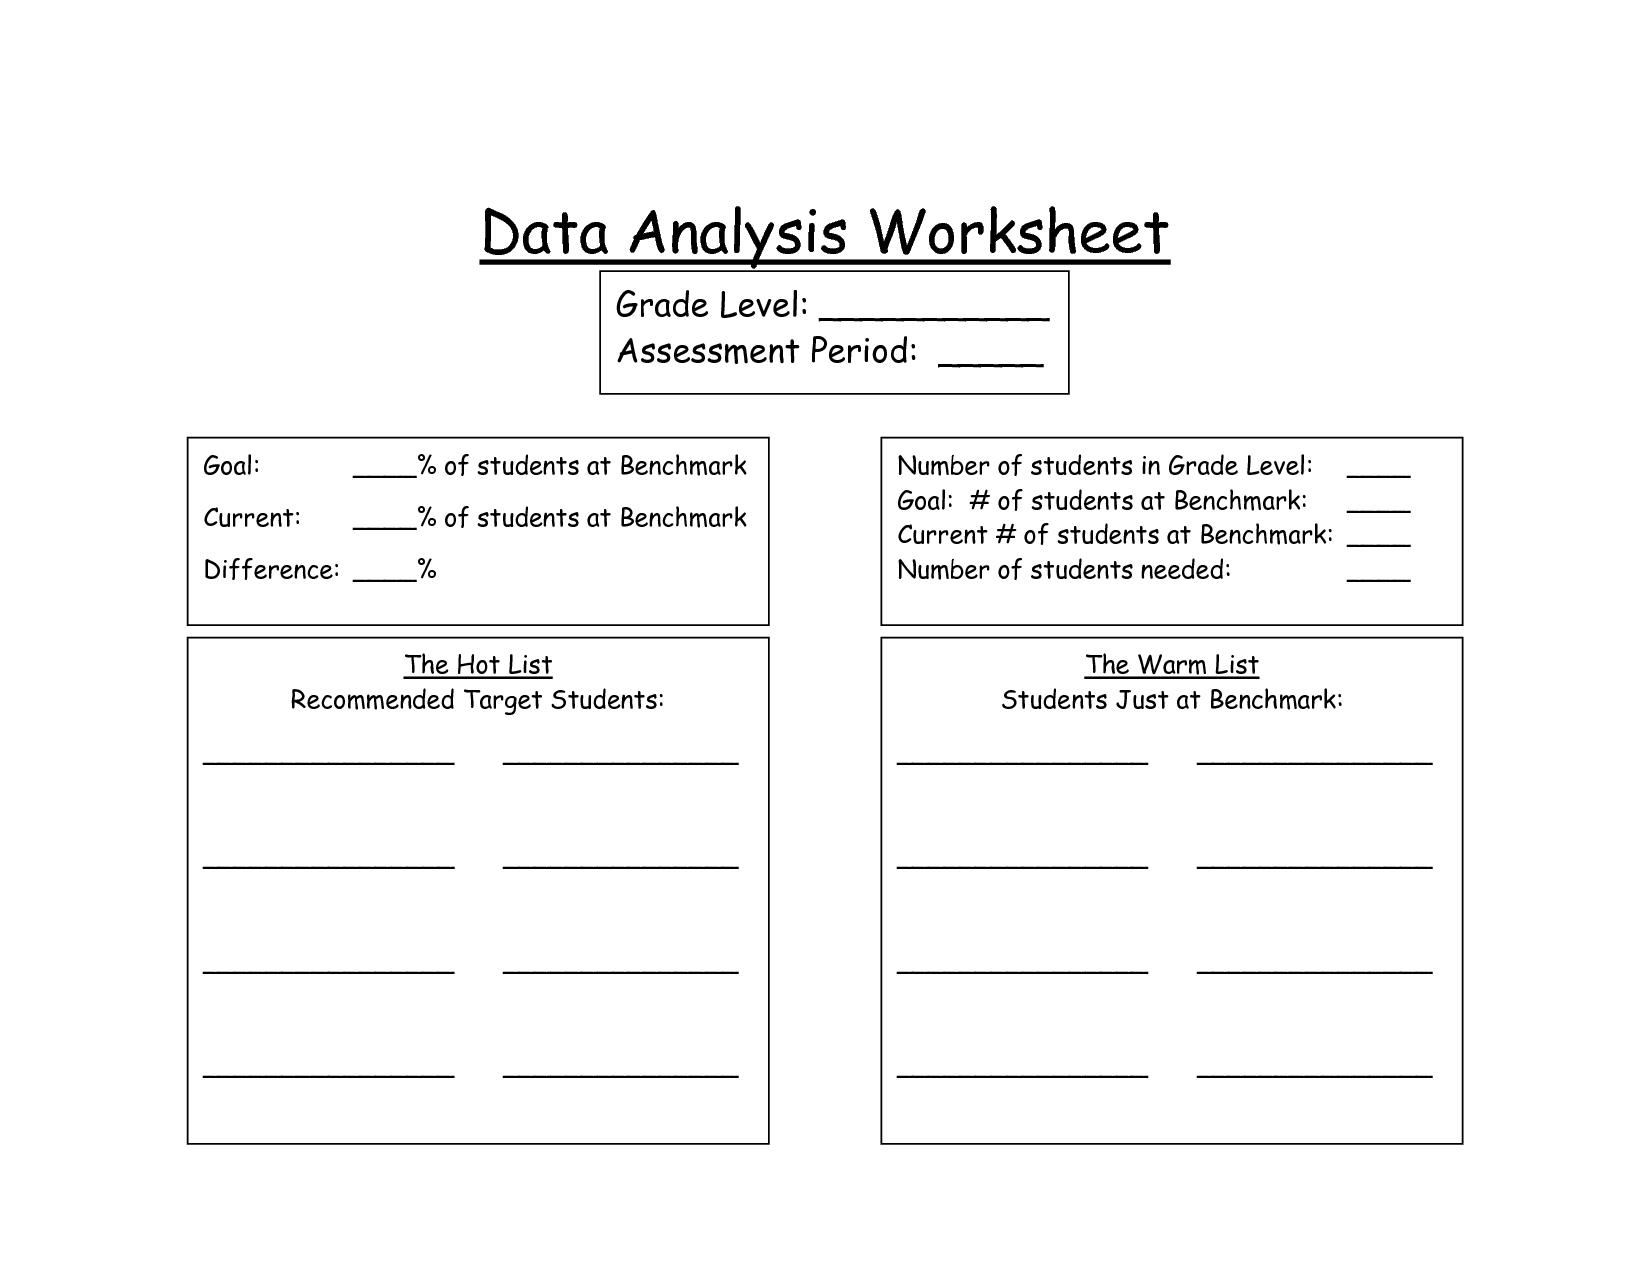 hight resolution of 33 Data Analysis Worksheet Answers - Worksheet Resource Plans